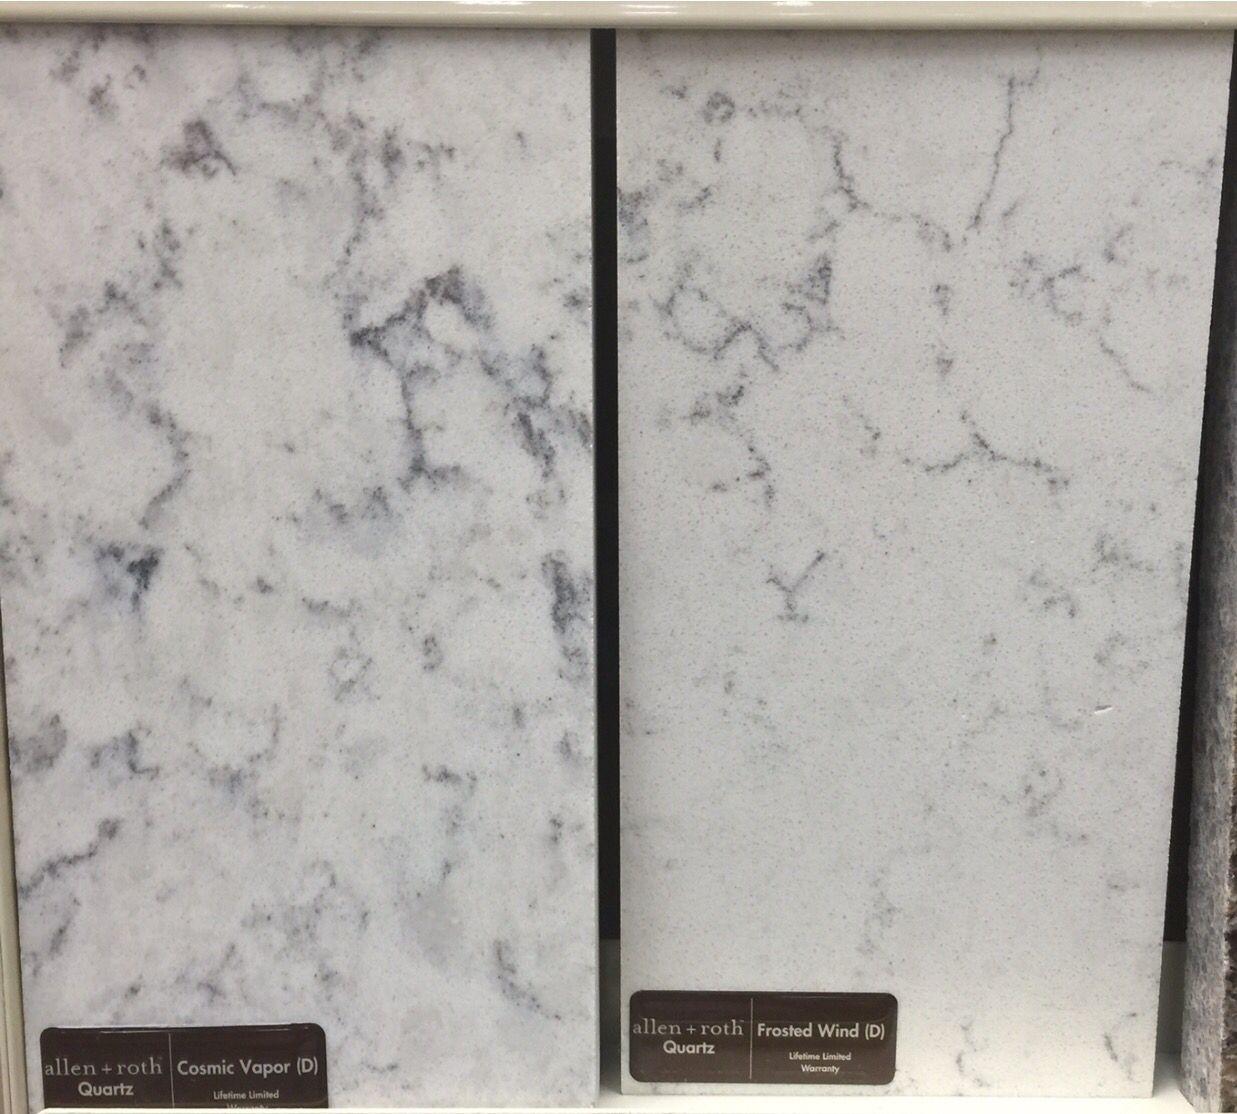 Allen + roth Quartz countertops. (L) Cosmic Vapor. (R) Frosted ...